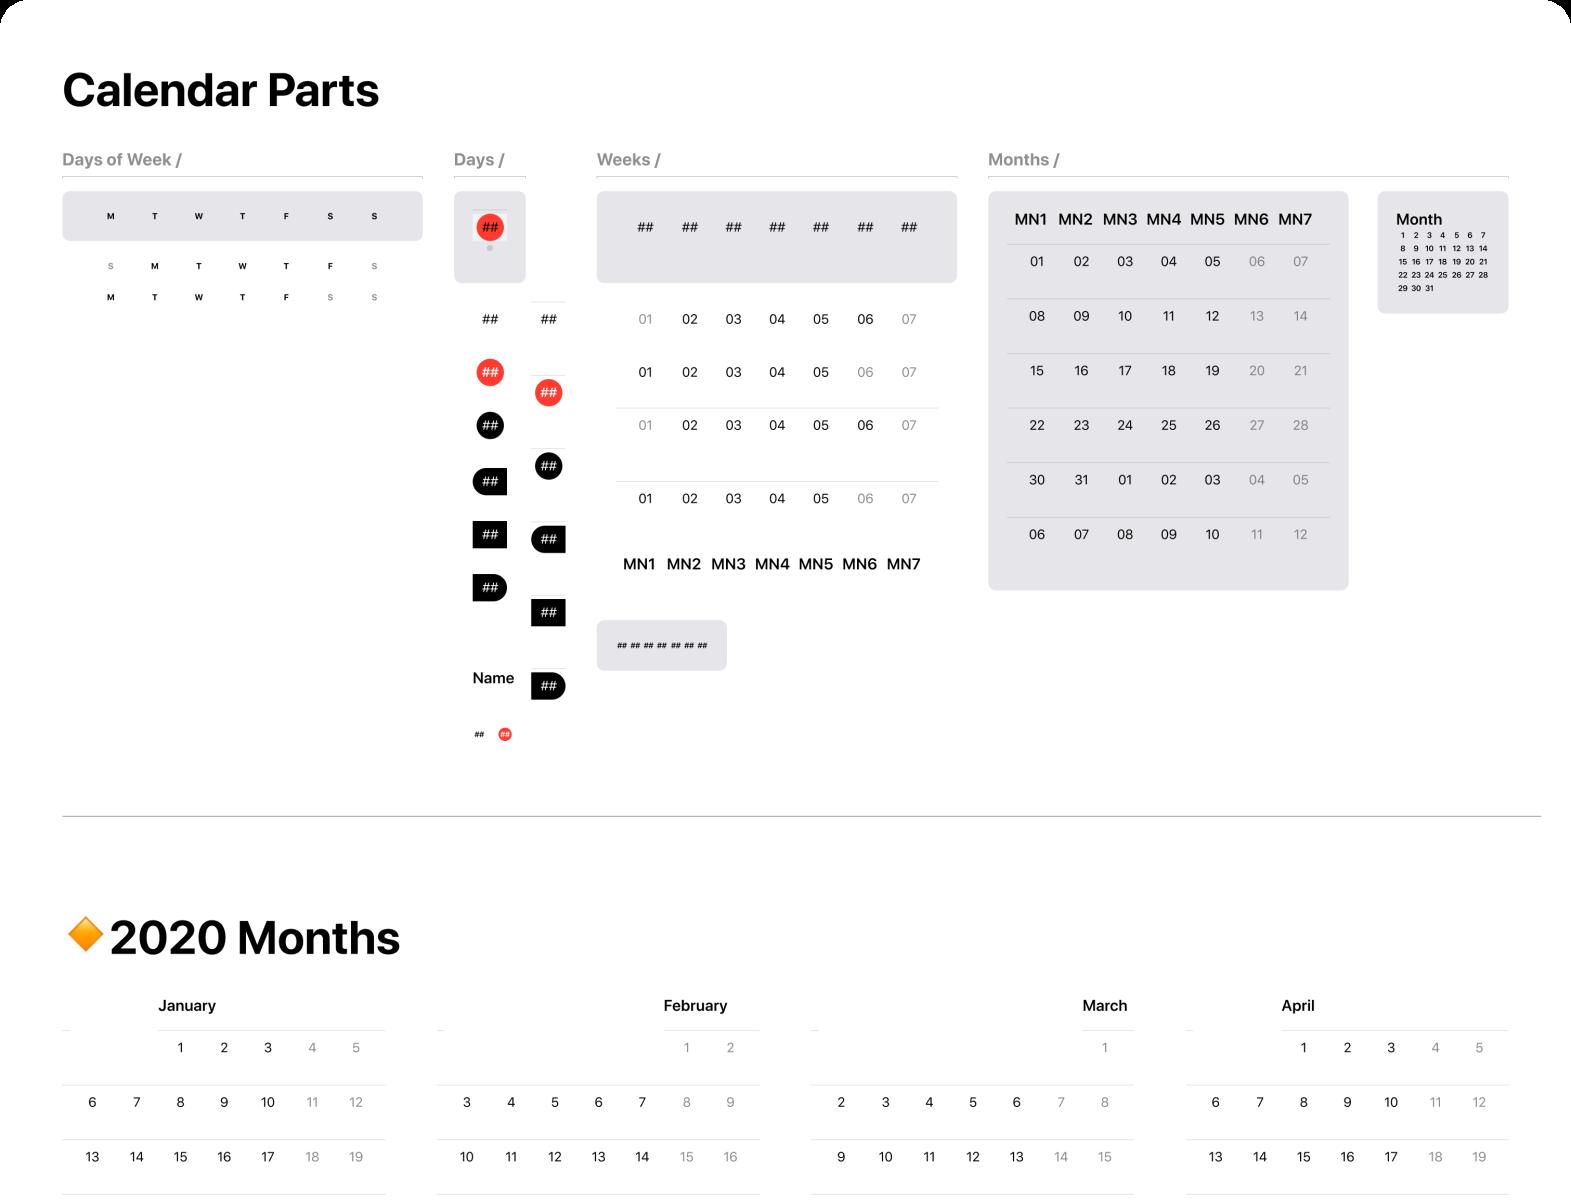 Figma iOS design library - Datepicker & Calendar Templates